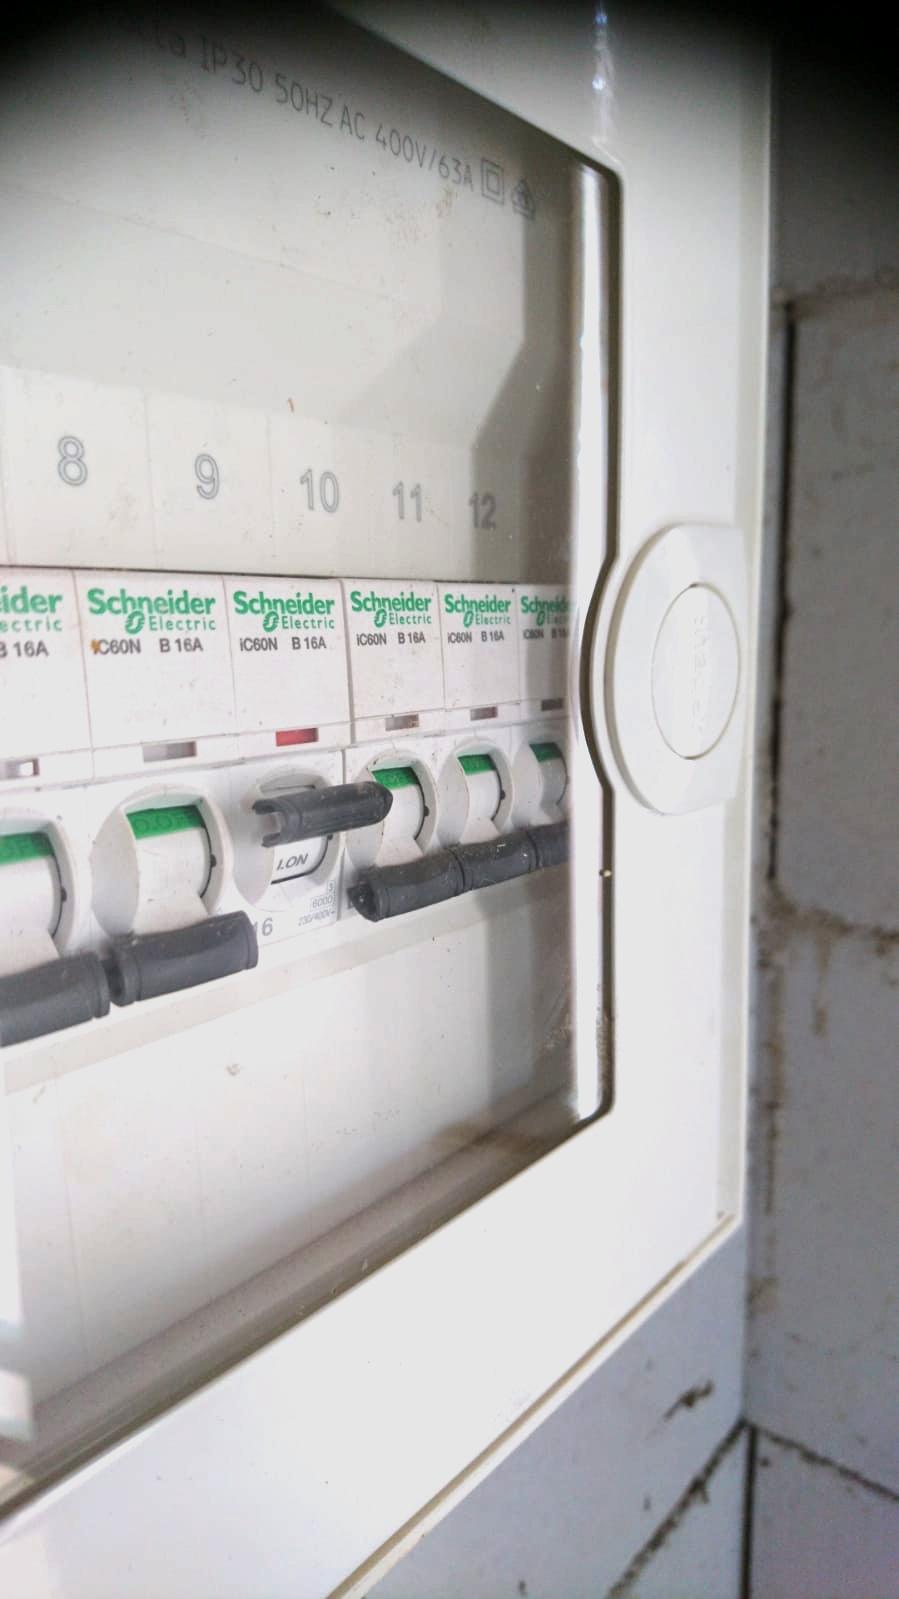 Spannungswandler, Spannungswandlerautomat, Spannungswandlerschutzschalter, Spannungswandlersicherung,